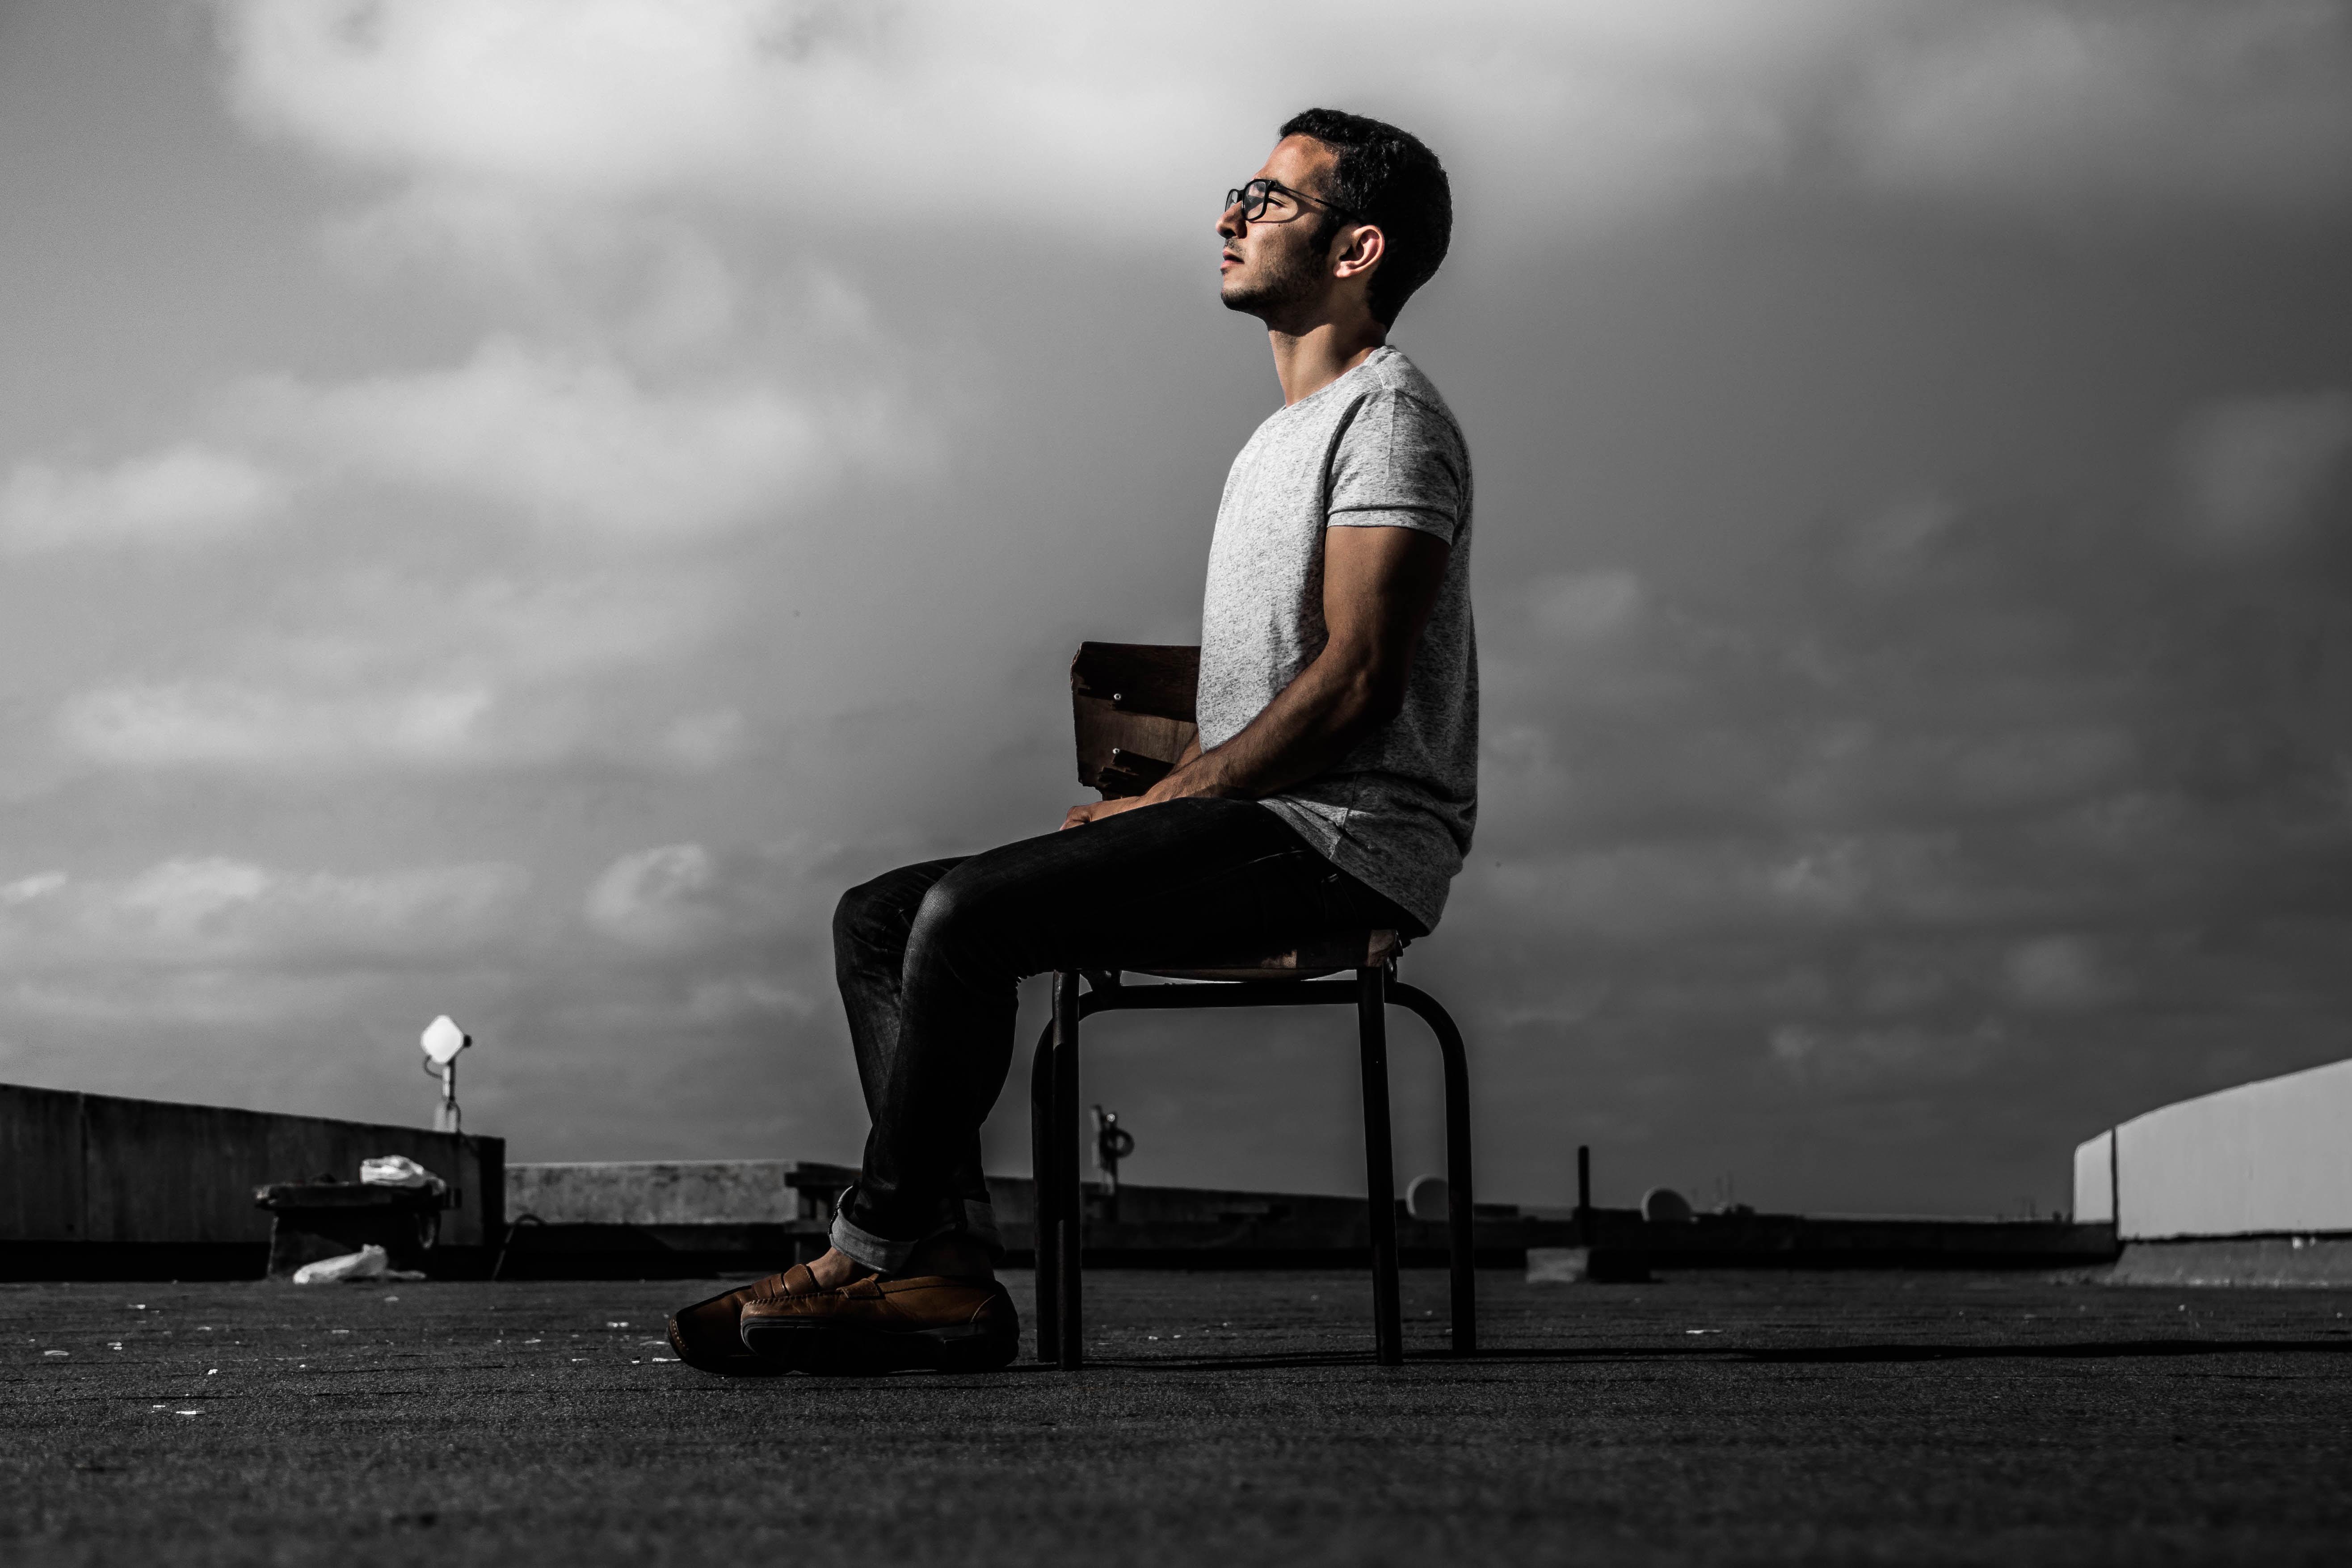 man sitting on chair during daytime